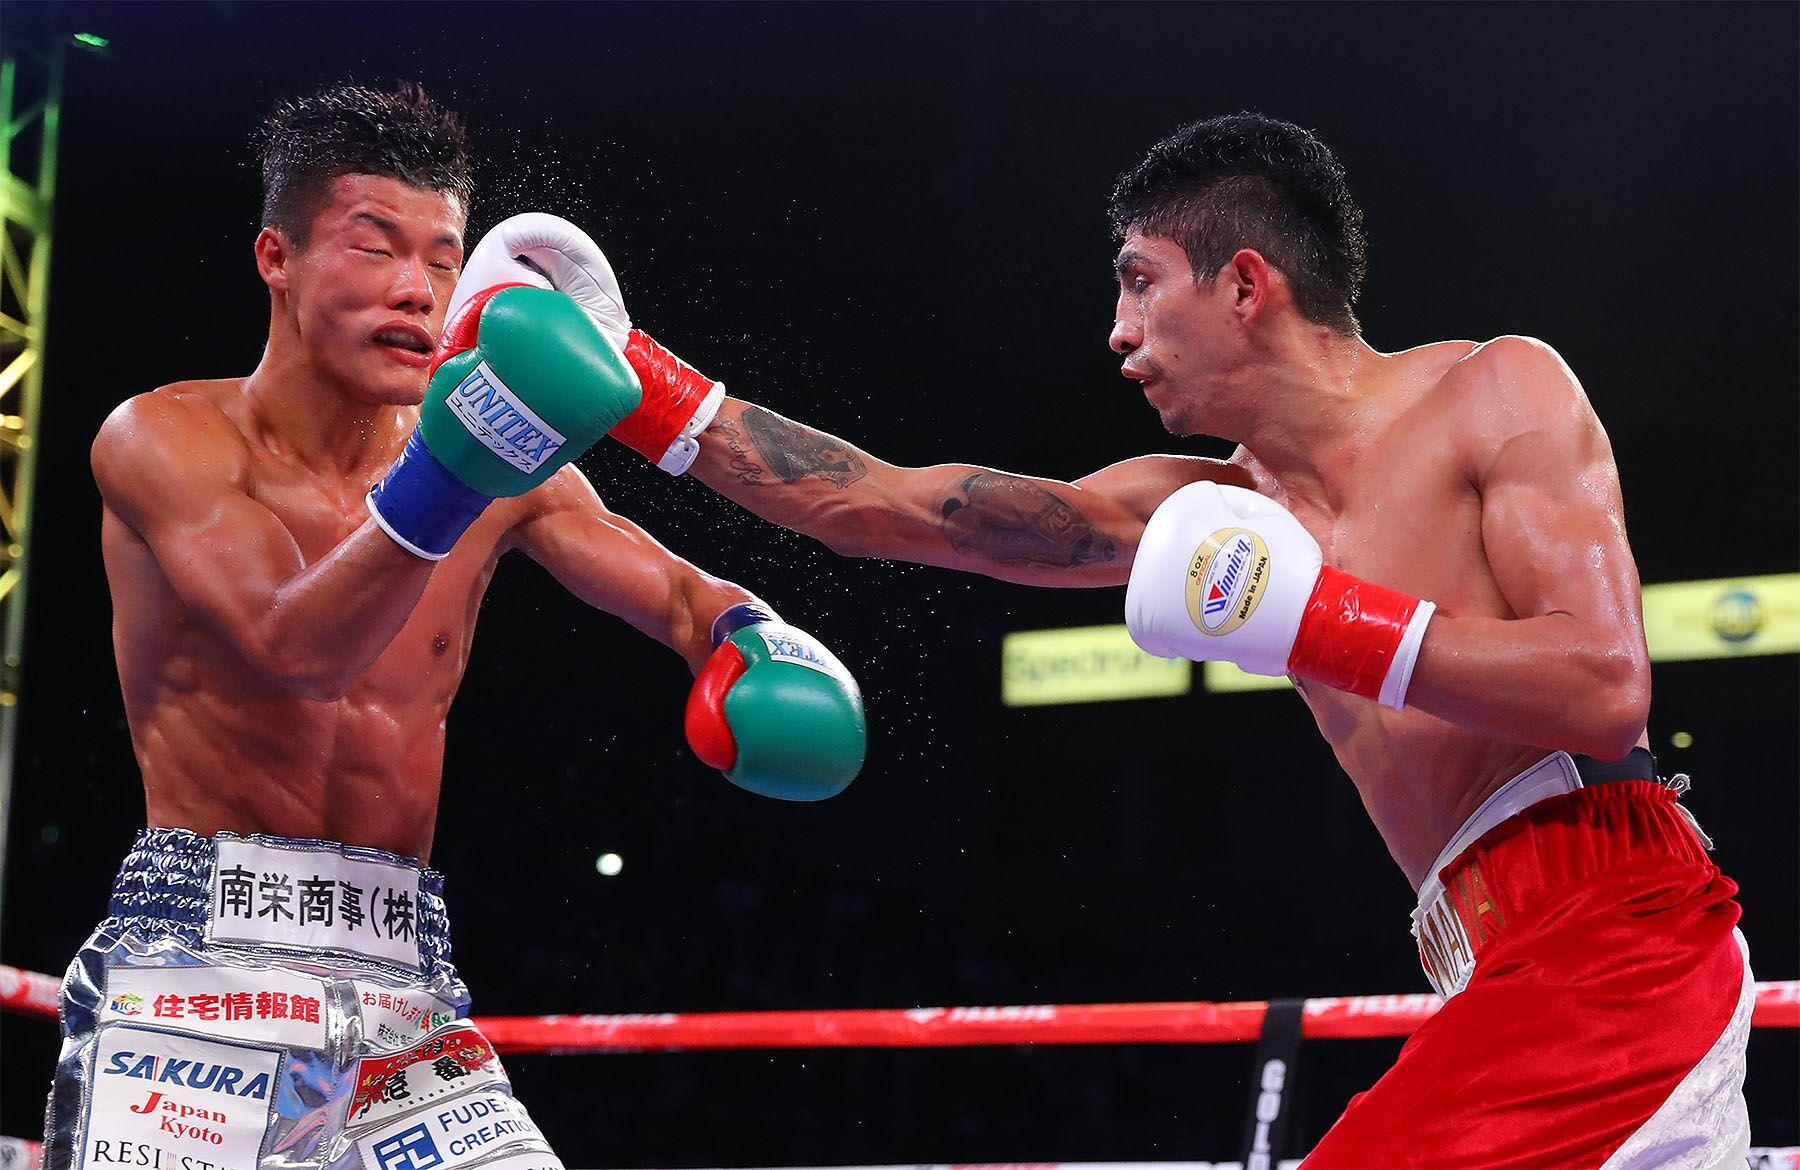 Rey Vargas lands a right hand on Tomoki Kameda by Tom Hogan/ Hogan Photos